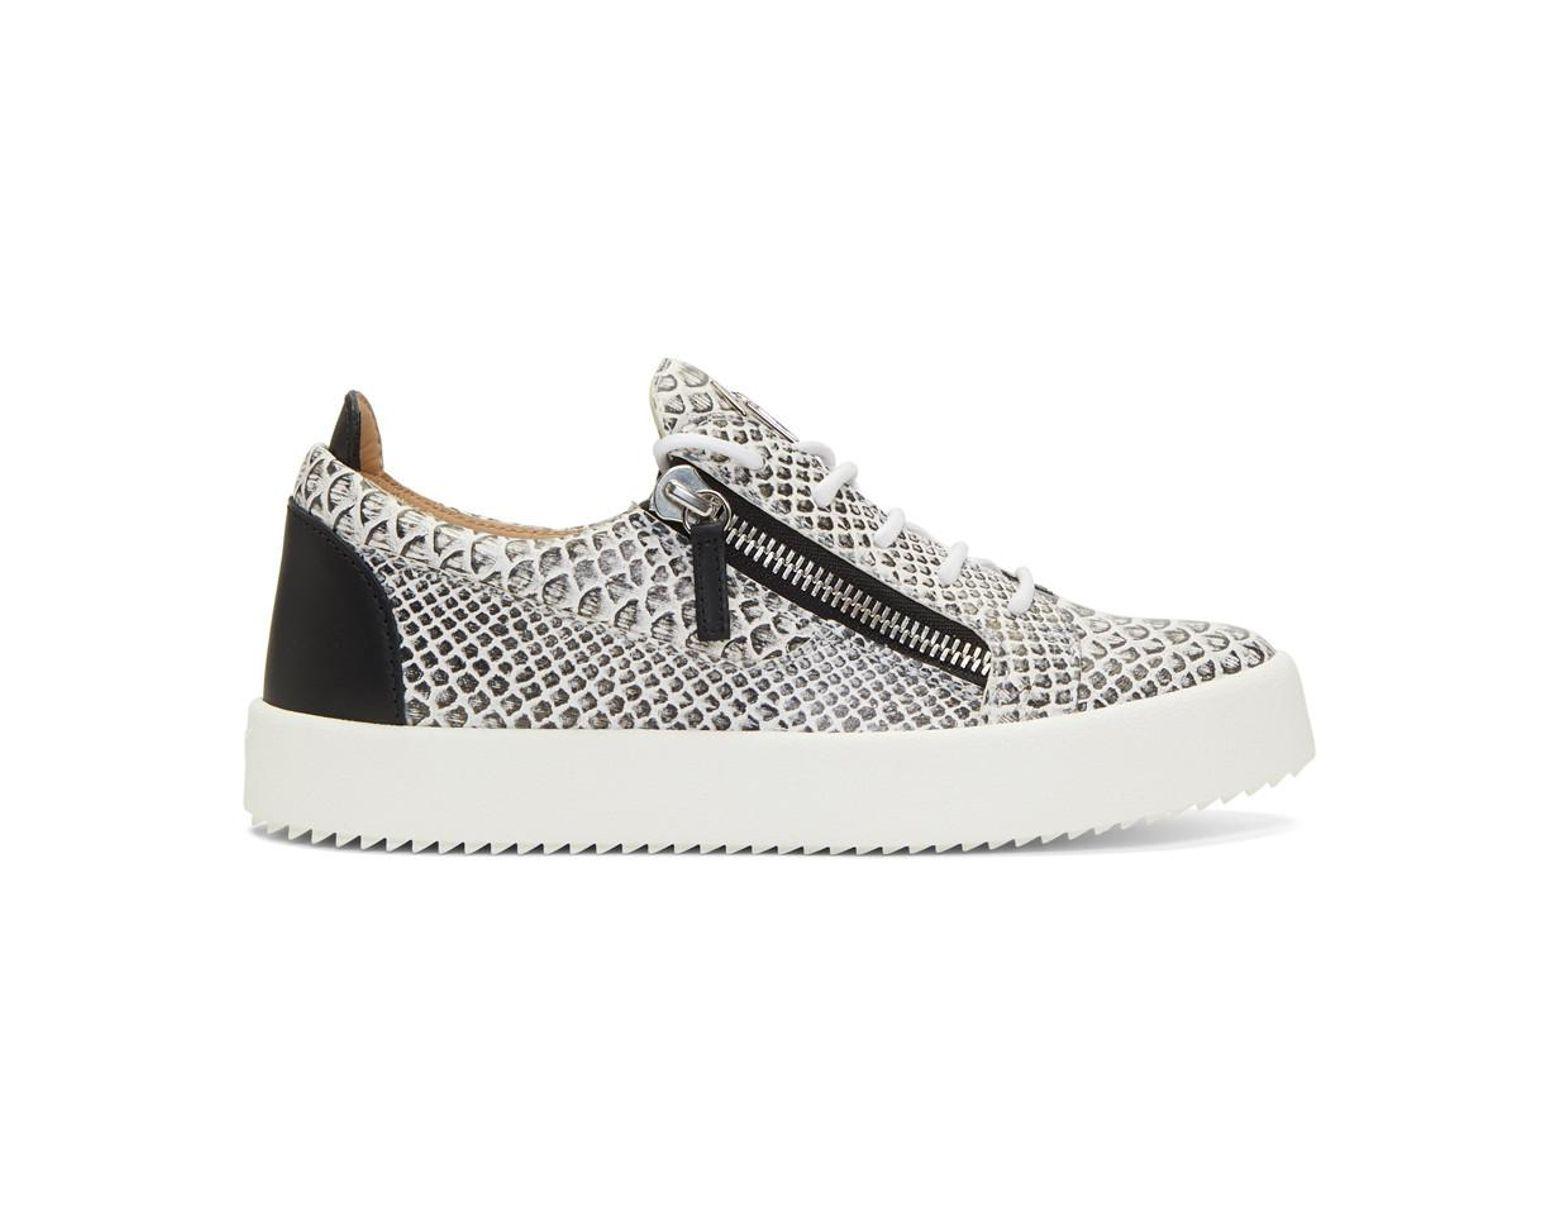 2c70e315729f9 Giuseppe Zanotti White And Black Croc Frankie Sneakers in White for Men -  Lyst